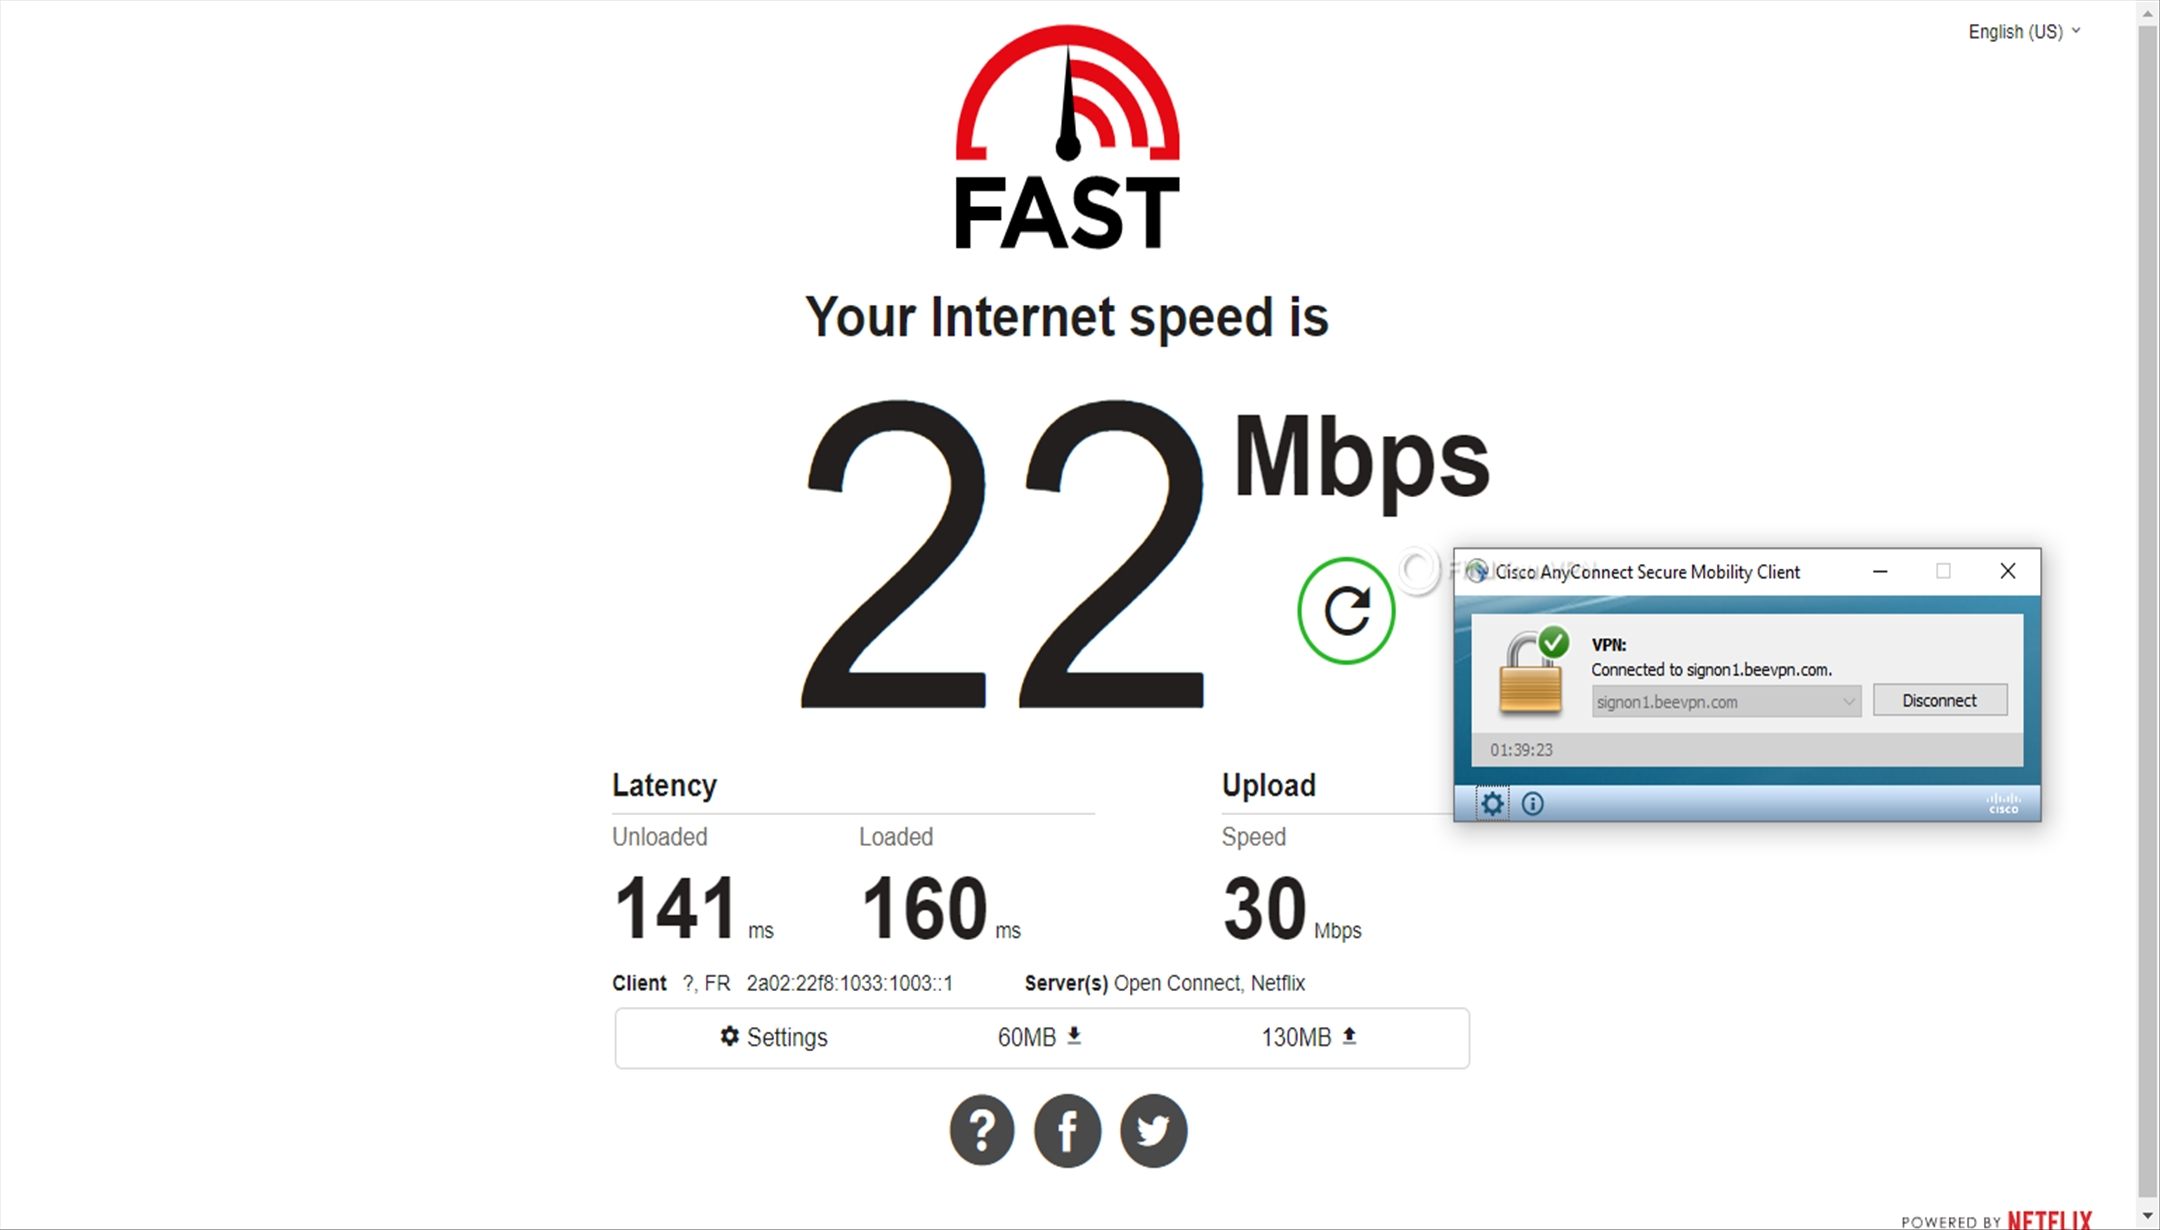 BeeVPN speed test France 22 Mbps